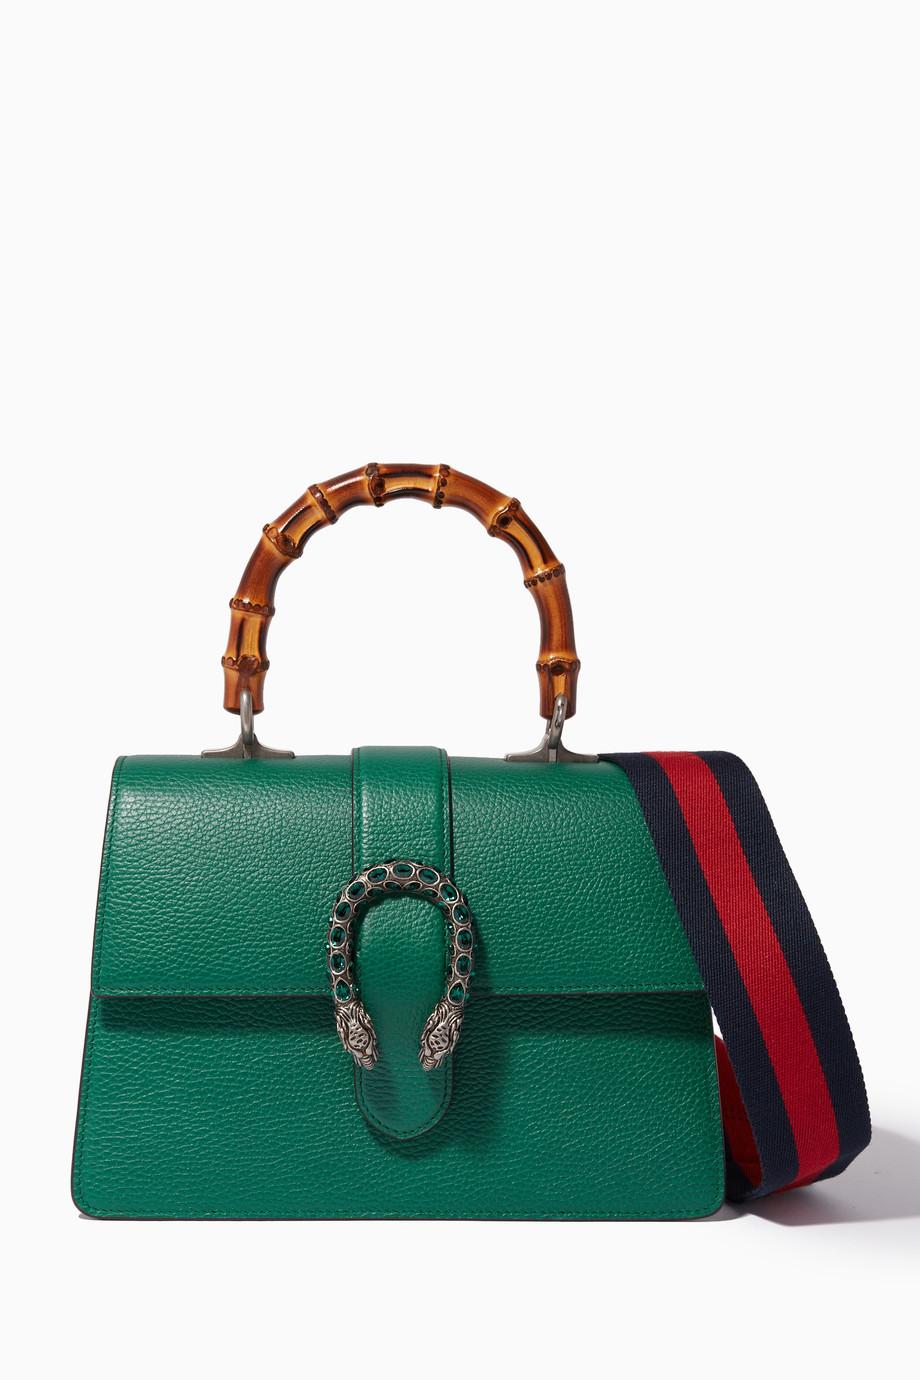 beb9ee20292 Shop Gucci Green Green Medium Dionysus Leather Top Handle Bag ...